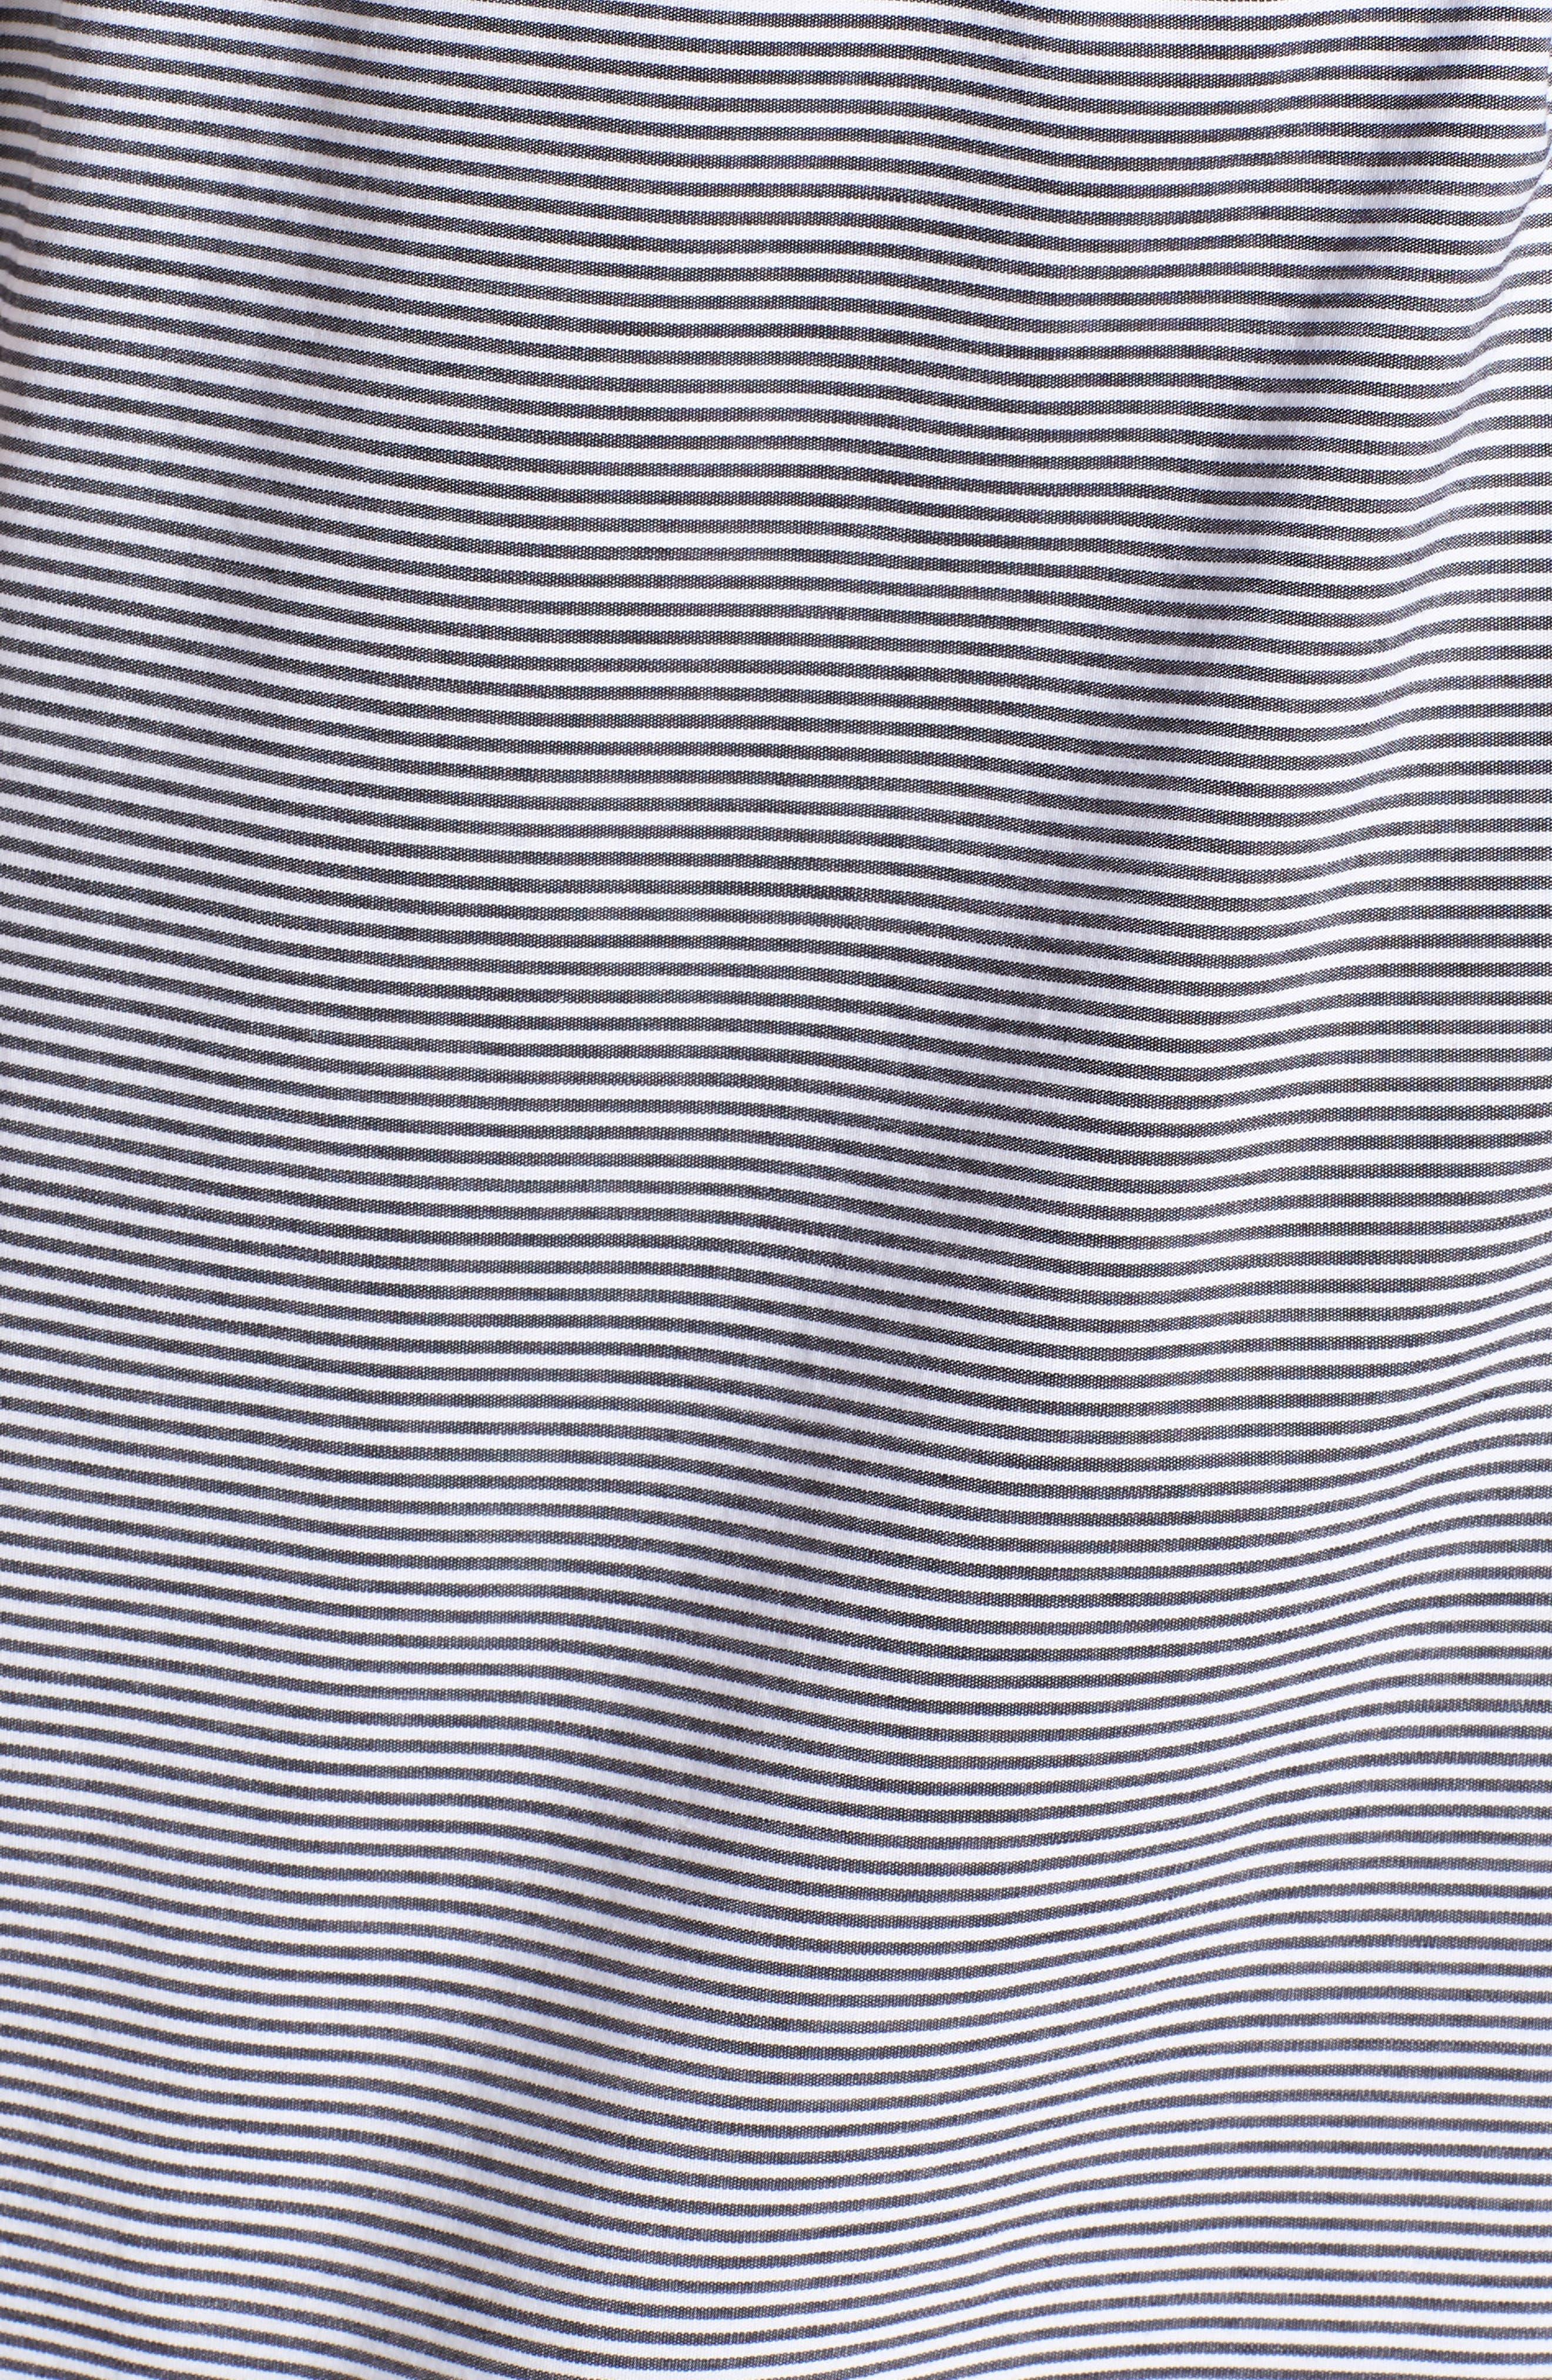 Striped Maxi Dress,                             Alternate thumbnail 6, color,                             002